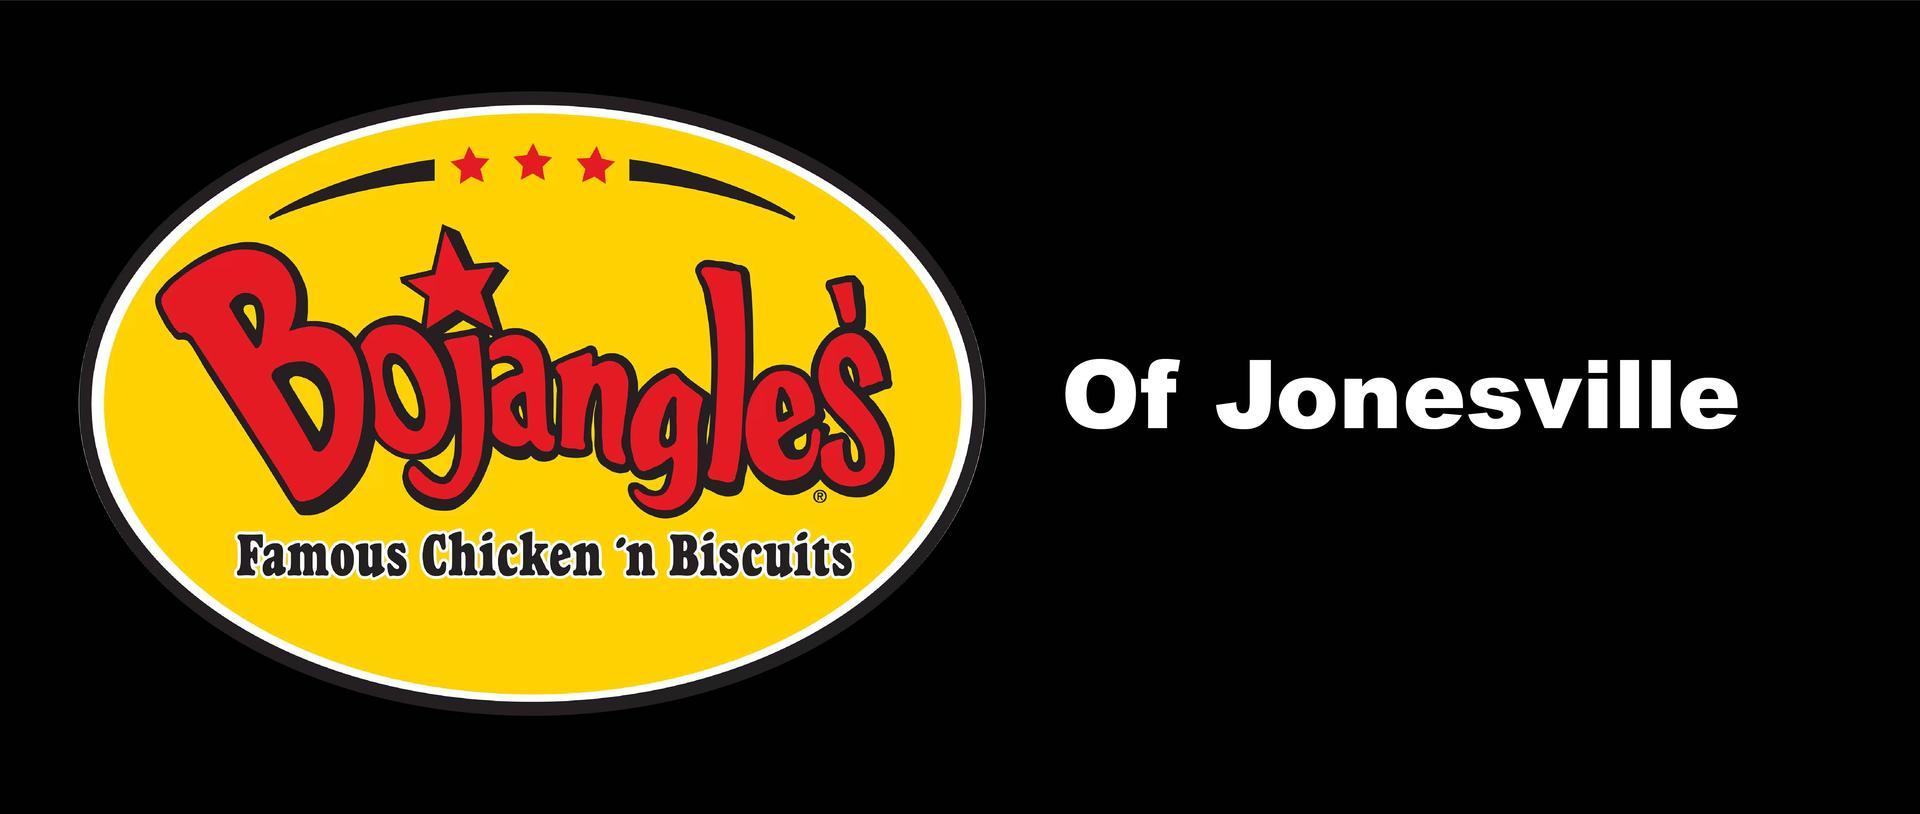 Bojangles of Jonesville